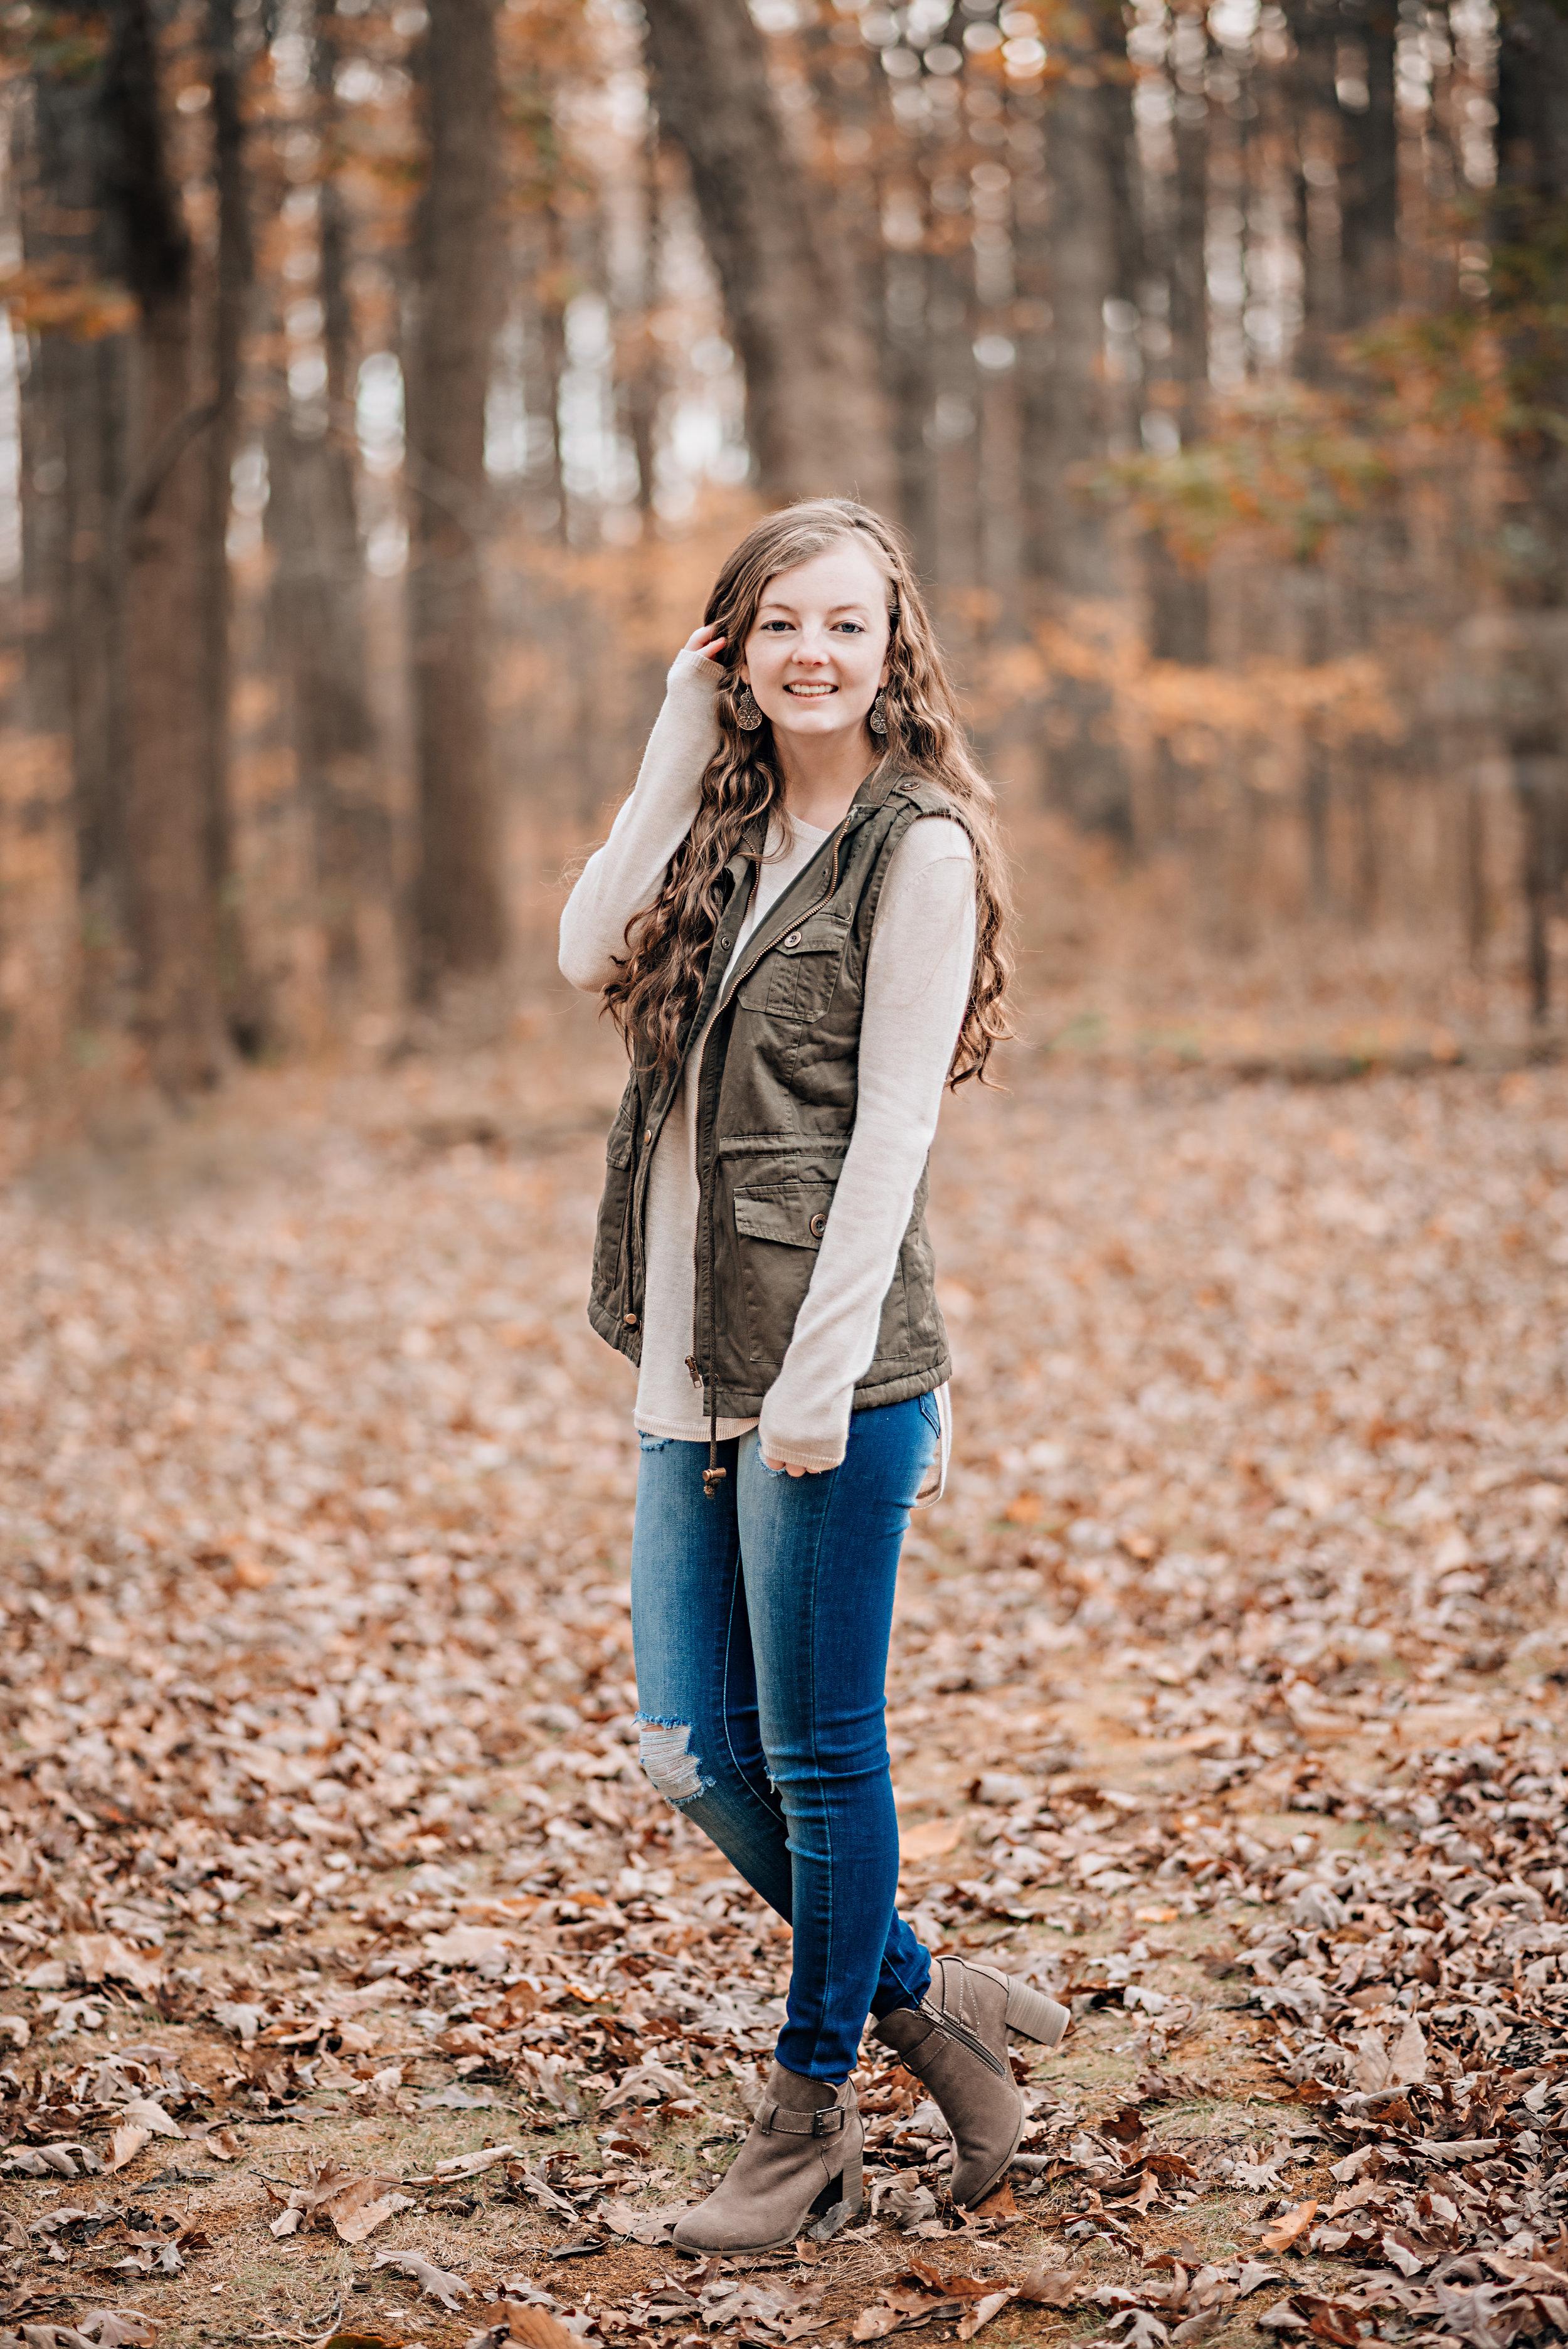 - Becca Mathews: Maryland Senior, Equine, and Couples Photographer